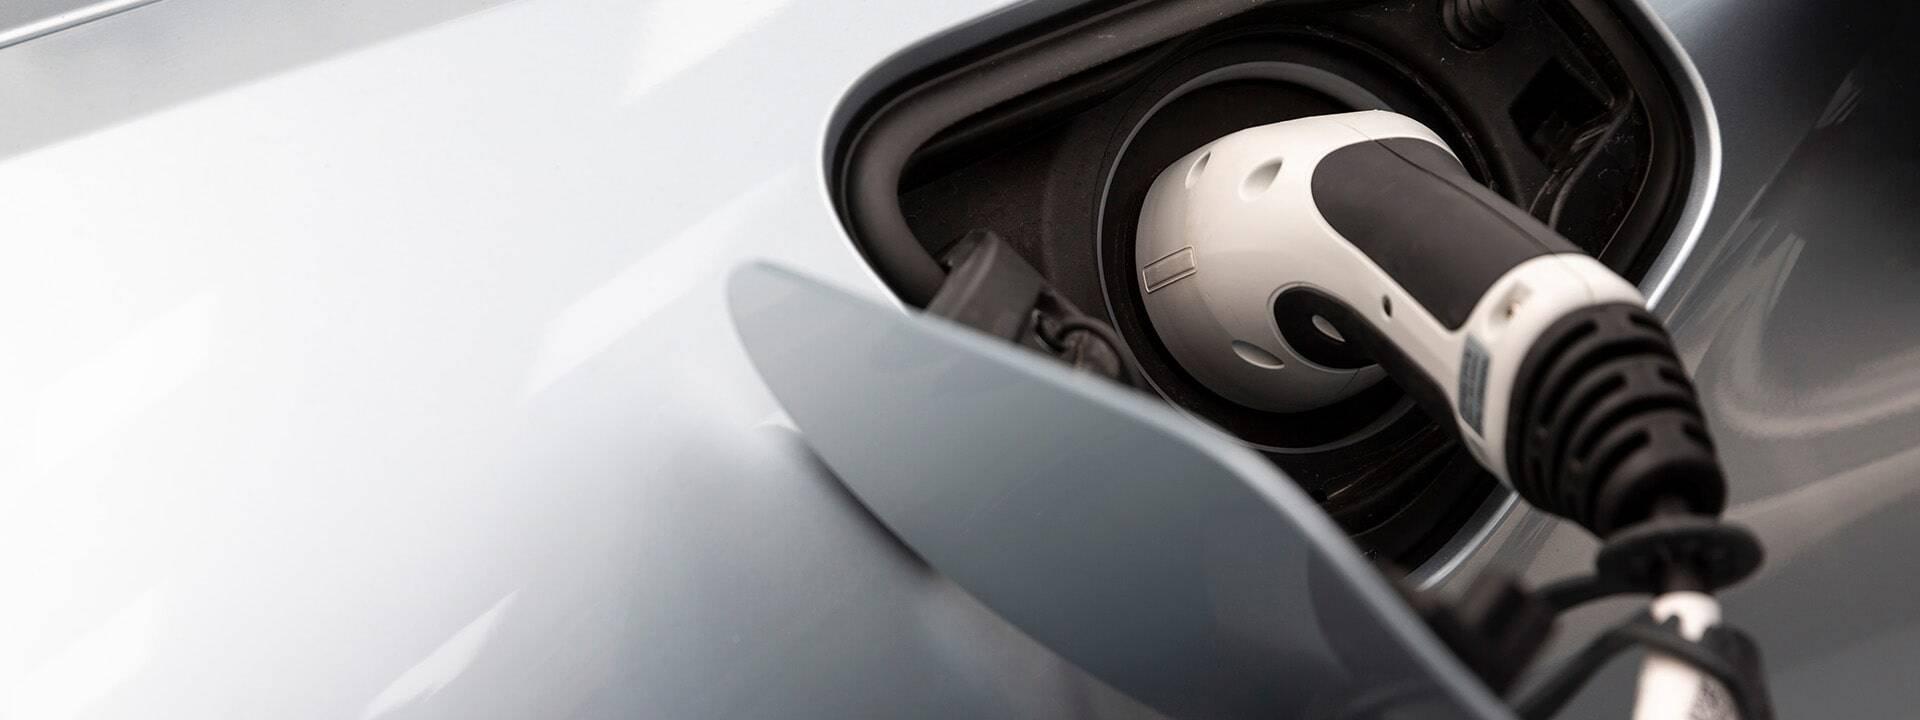 borne-recharge-electrique-montreal